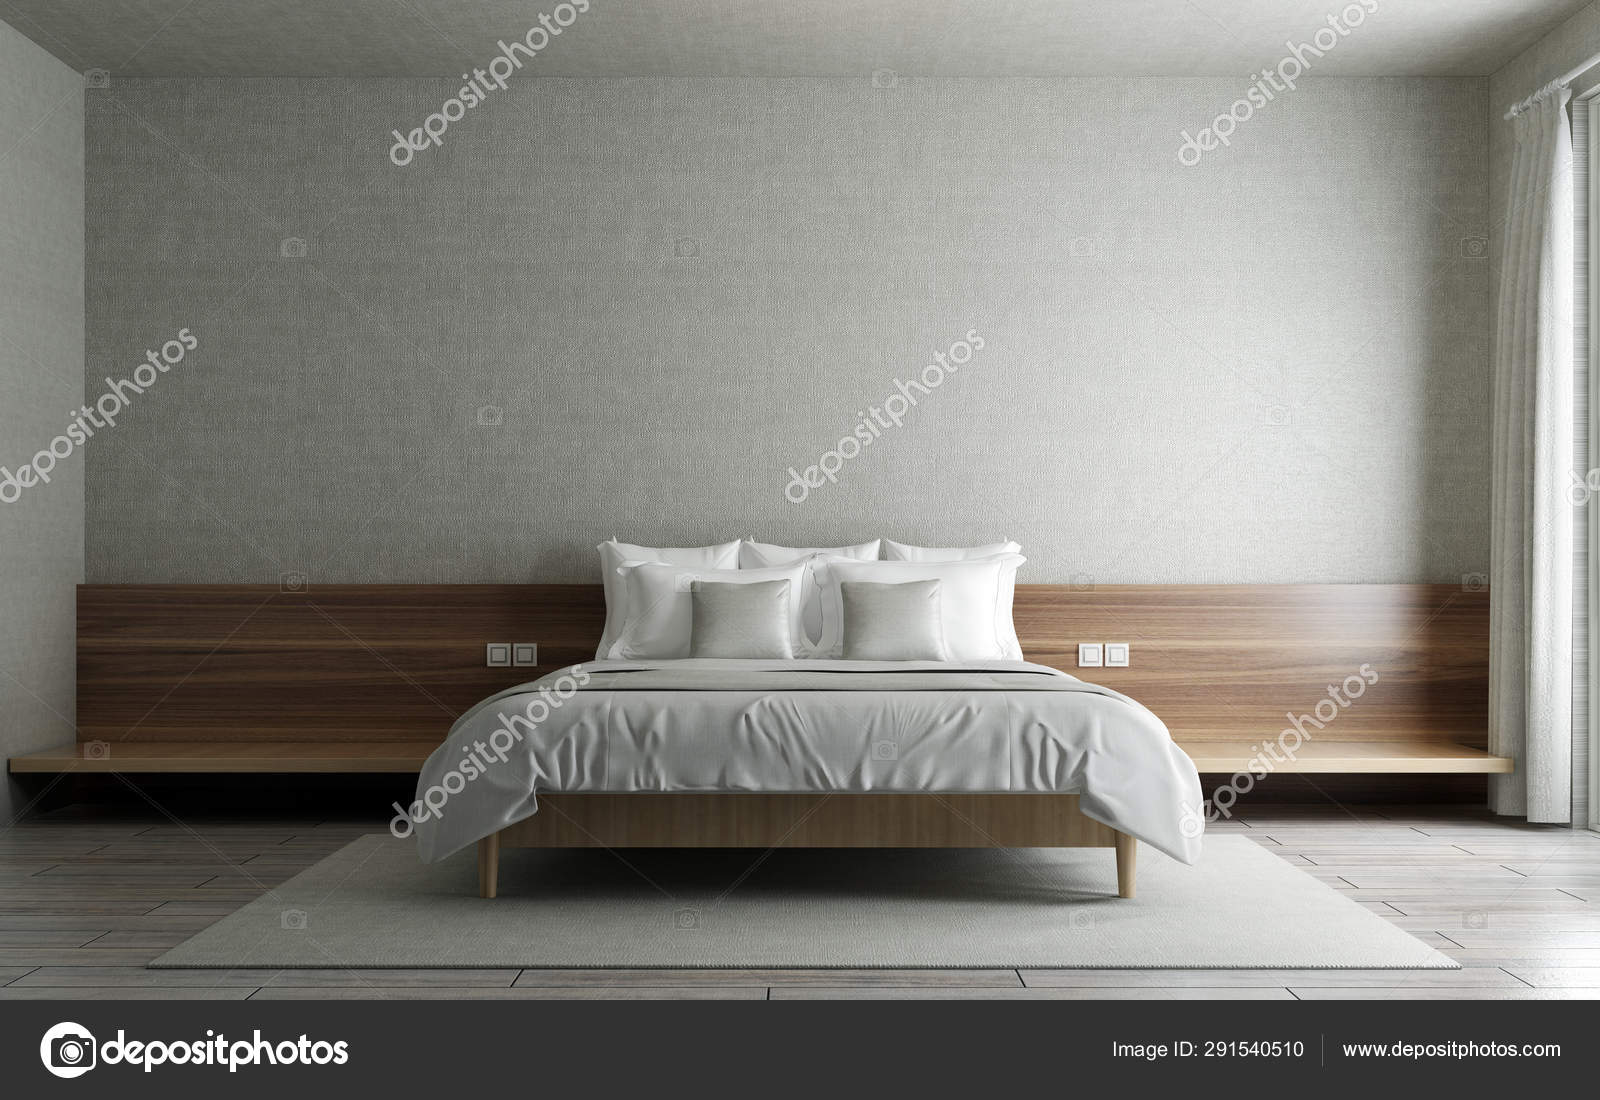 Modern Minimal Bedroom Interior Design White Pattern Wall Background Stock Photo C Teeraphan 291540510